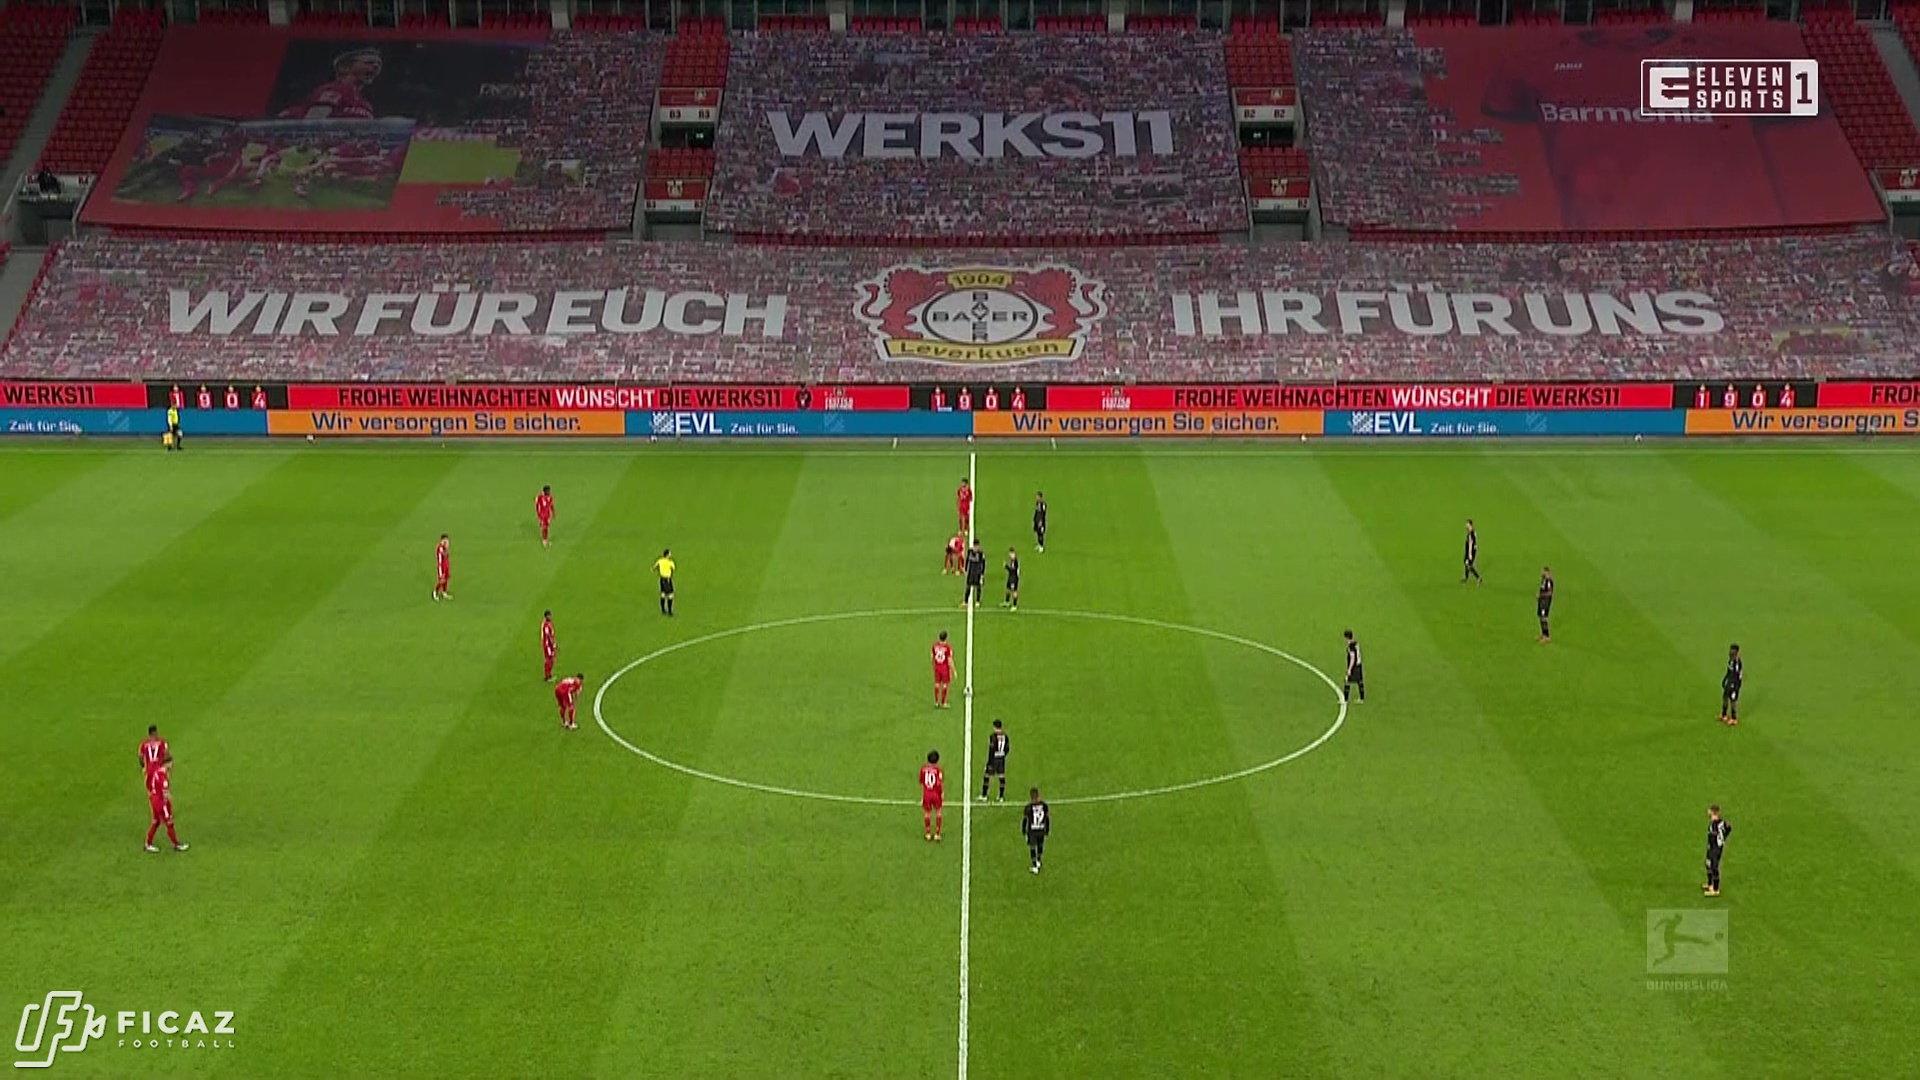 Bayer 04 Leverkusen - Main